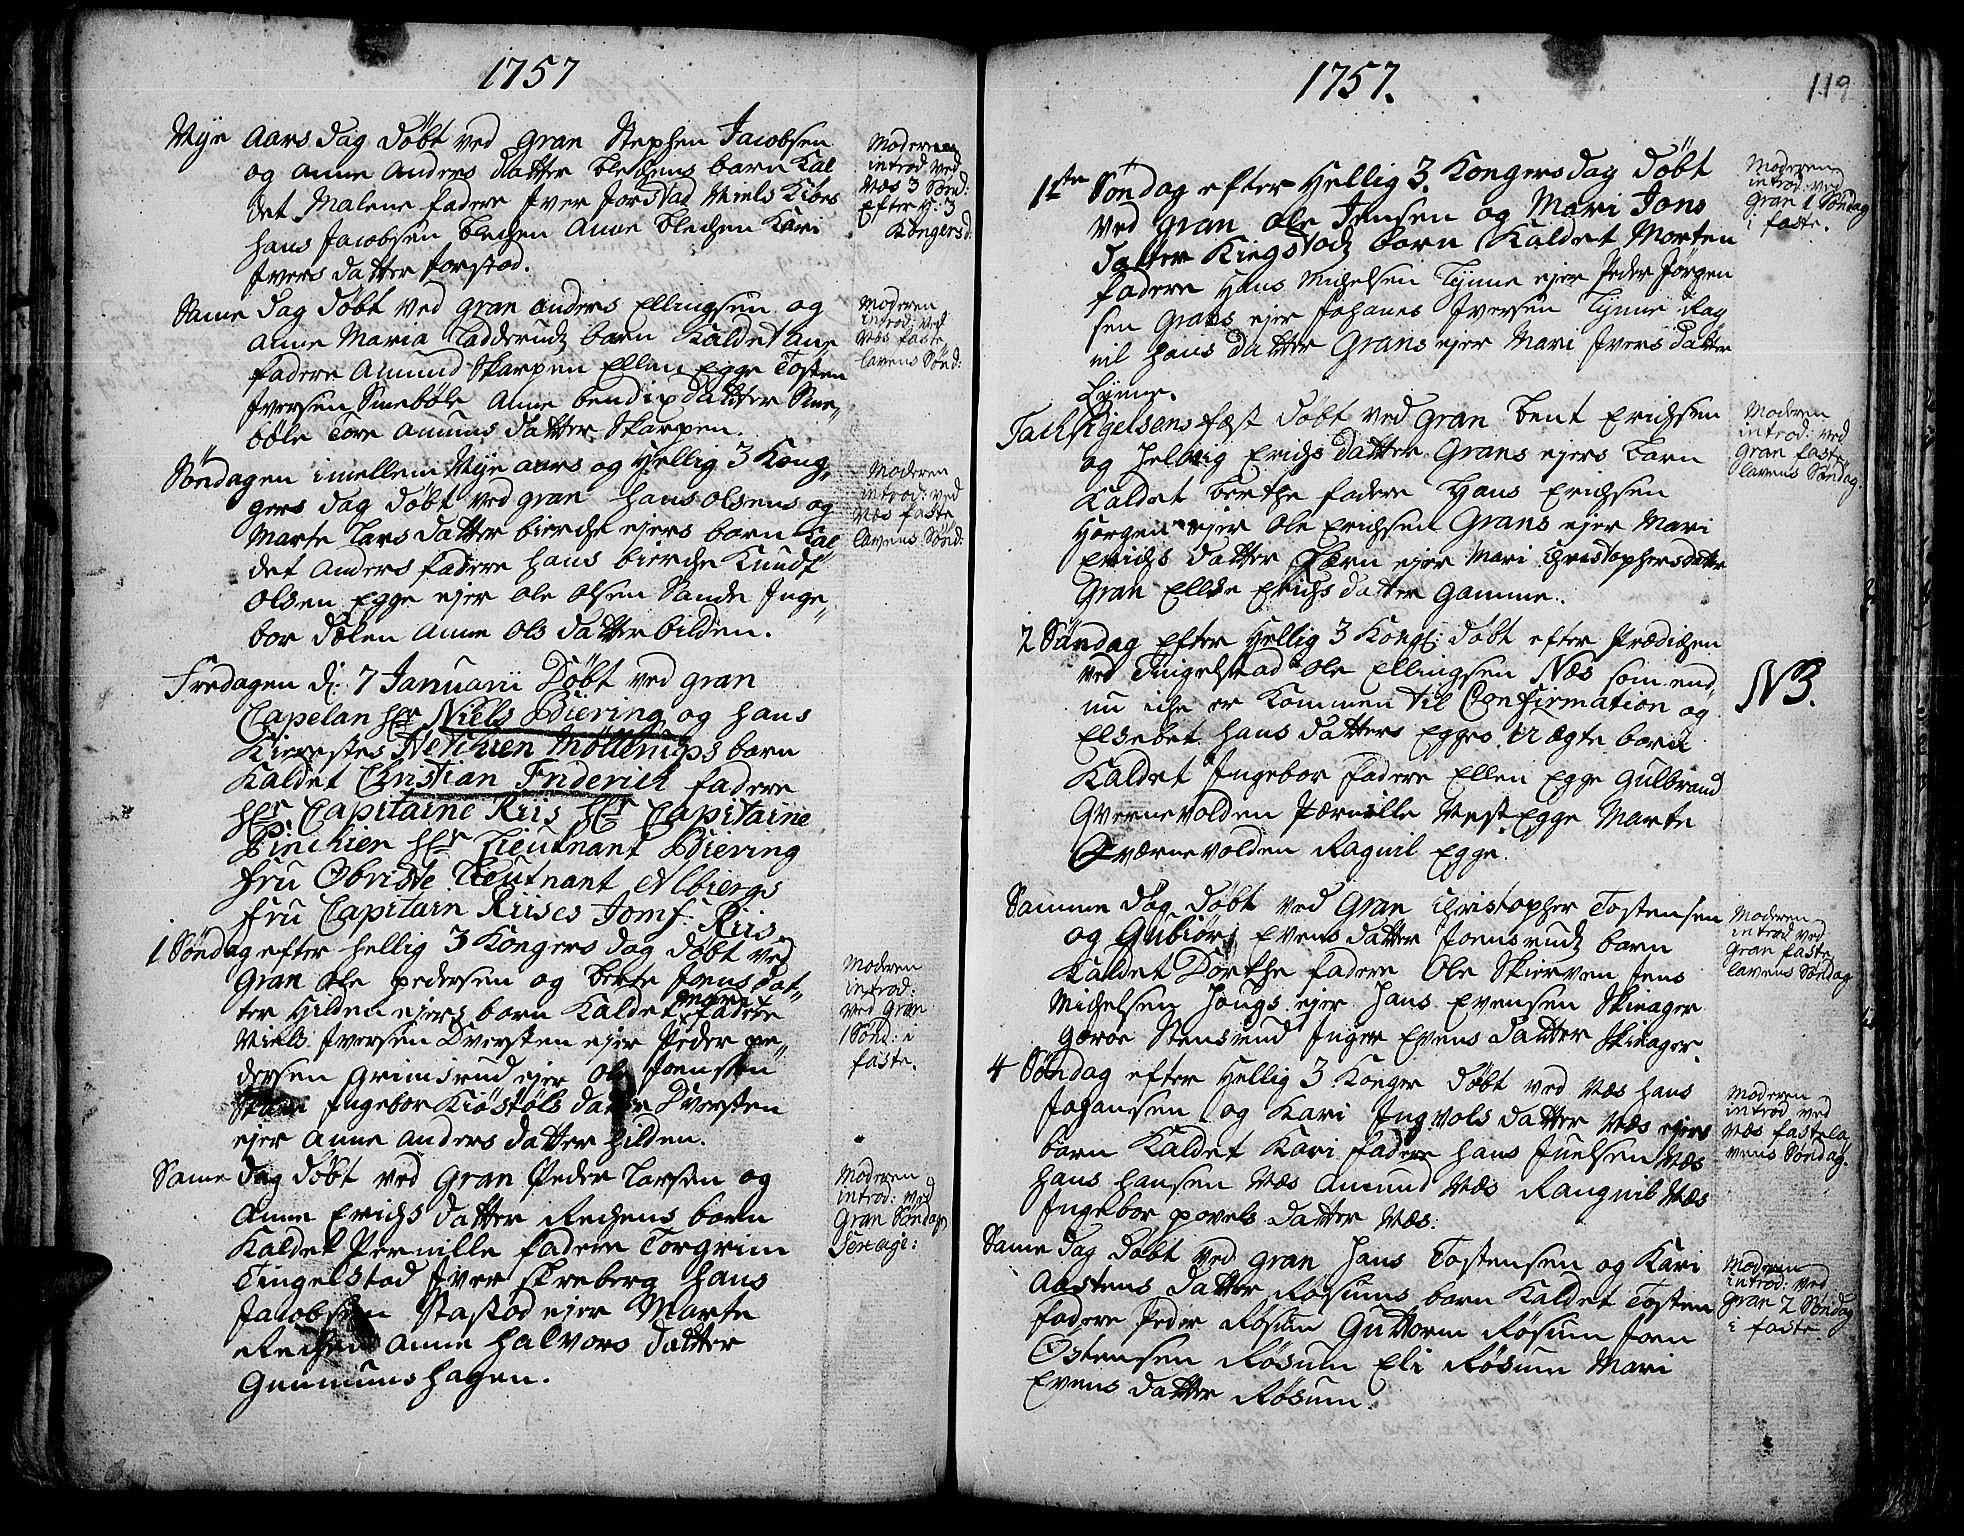 SAH, Gran prestekontor, Ministerialbok nr. 3, 1745-1758, s. 119